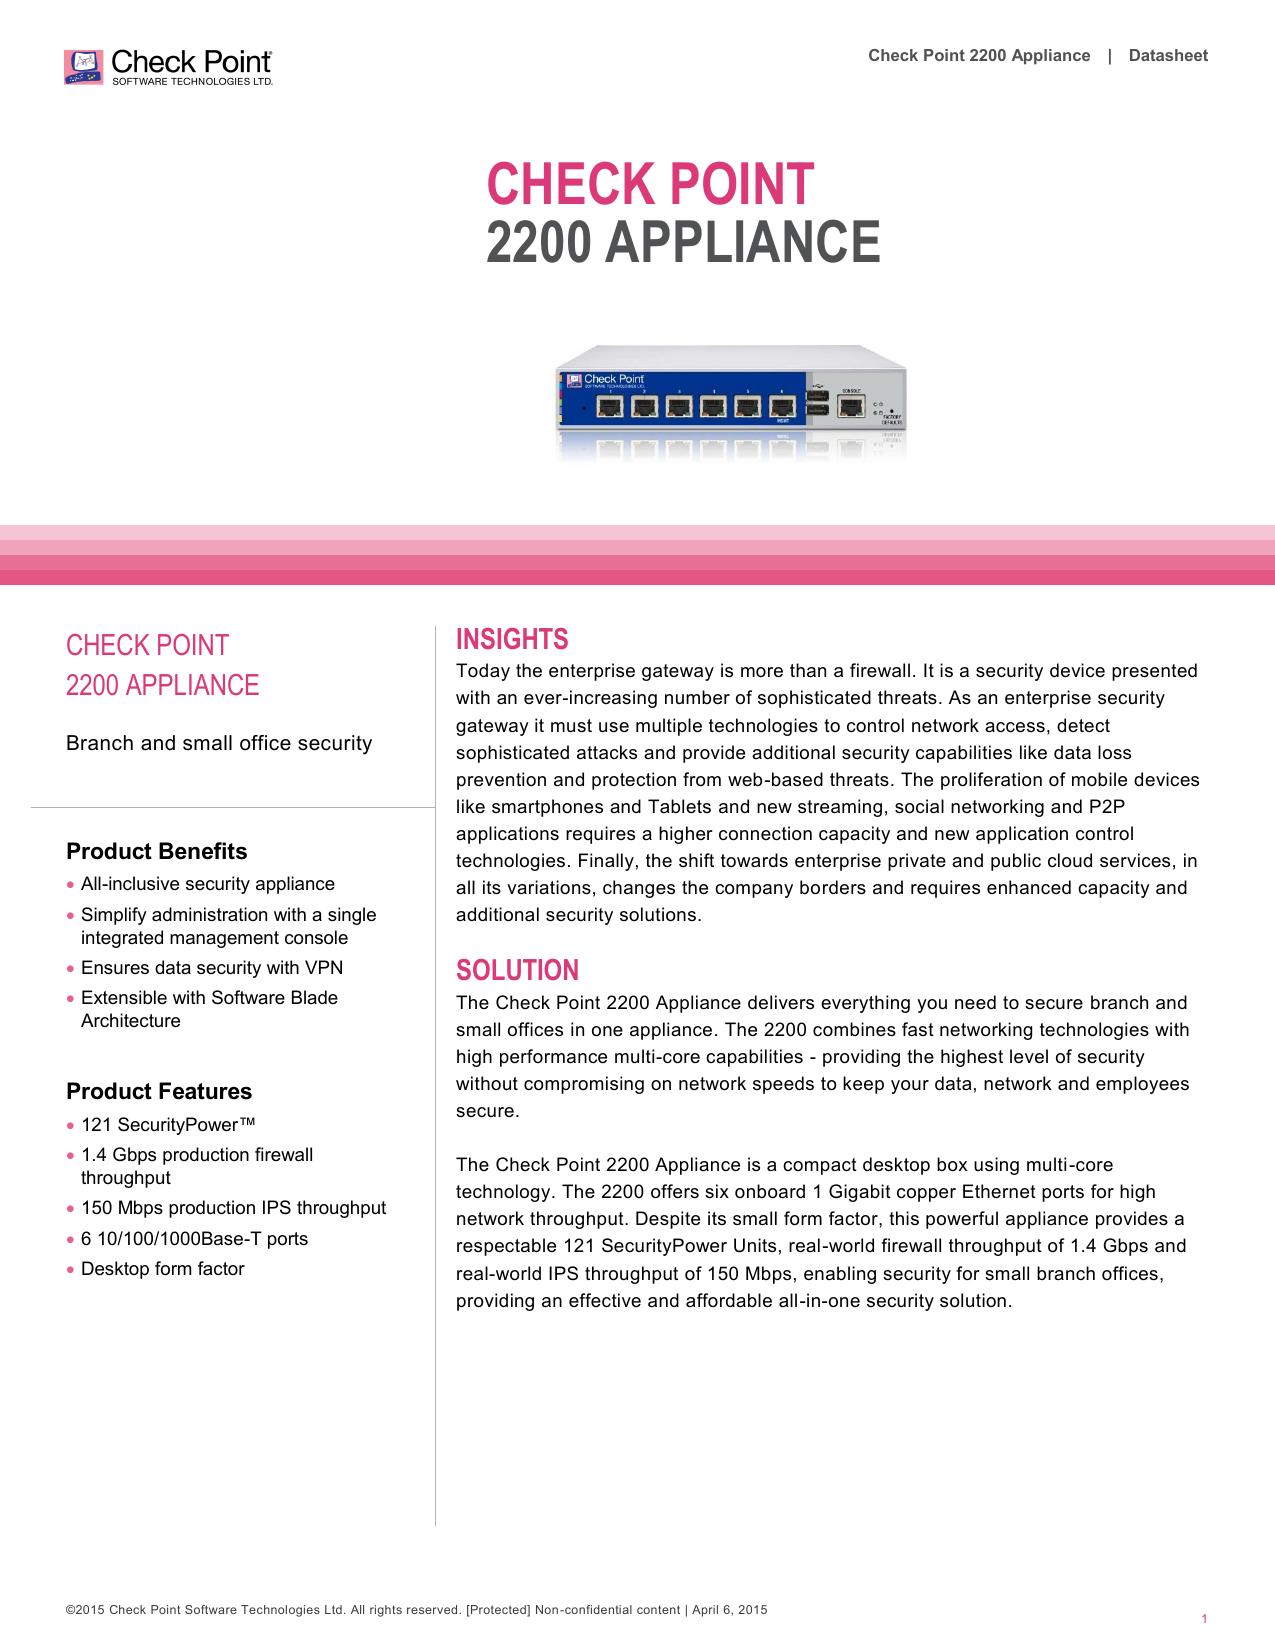 2200 Appliance Datasheet - Check Point Software Technologies